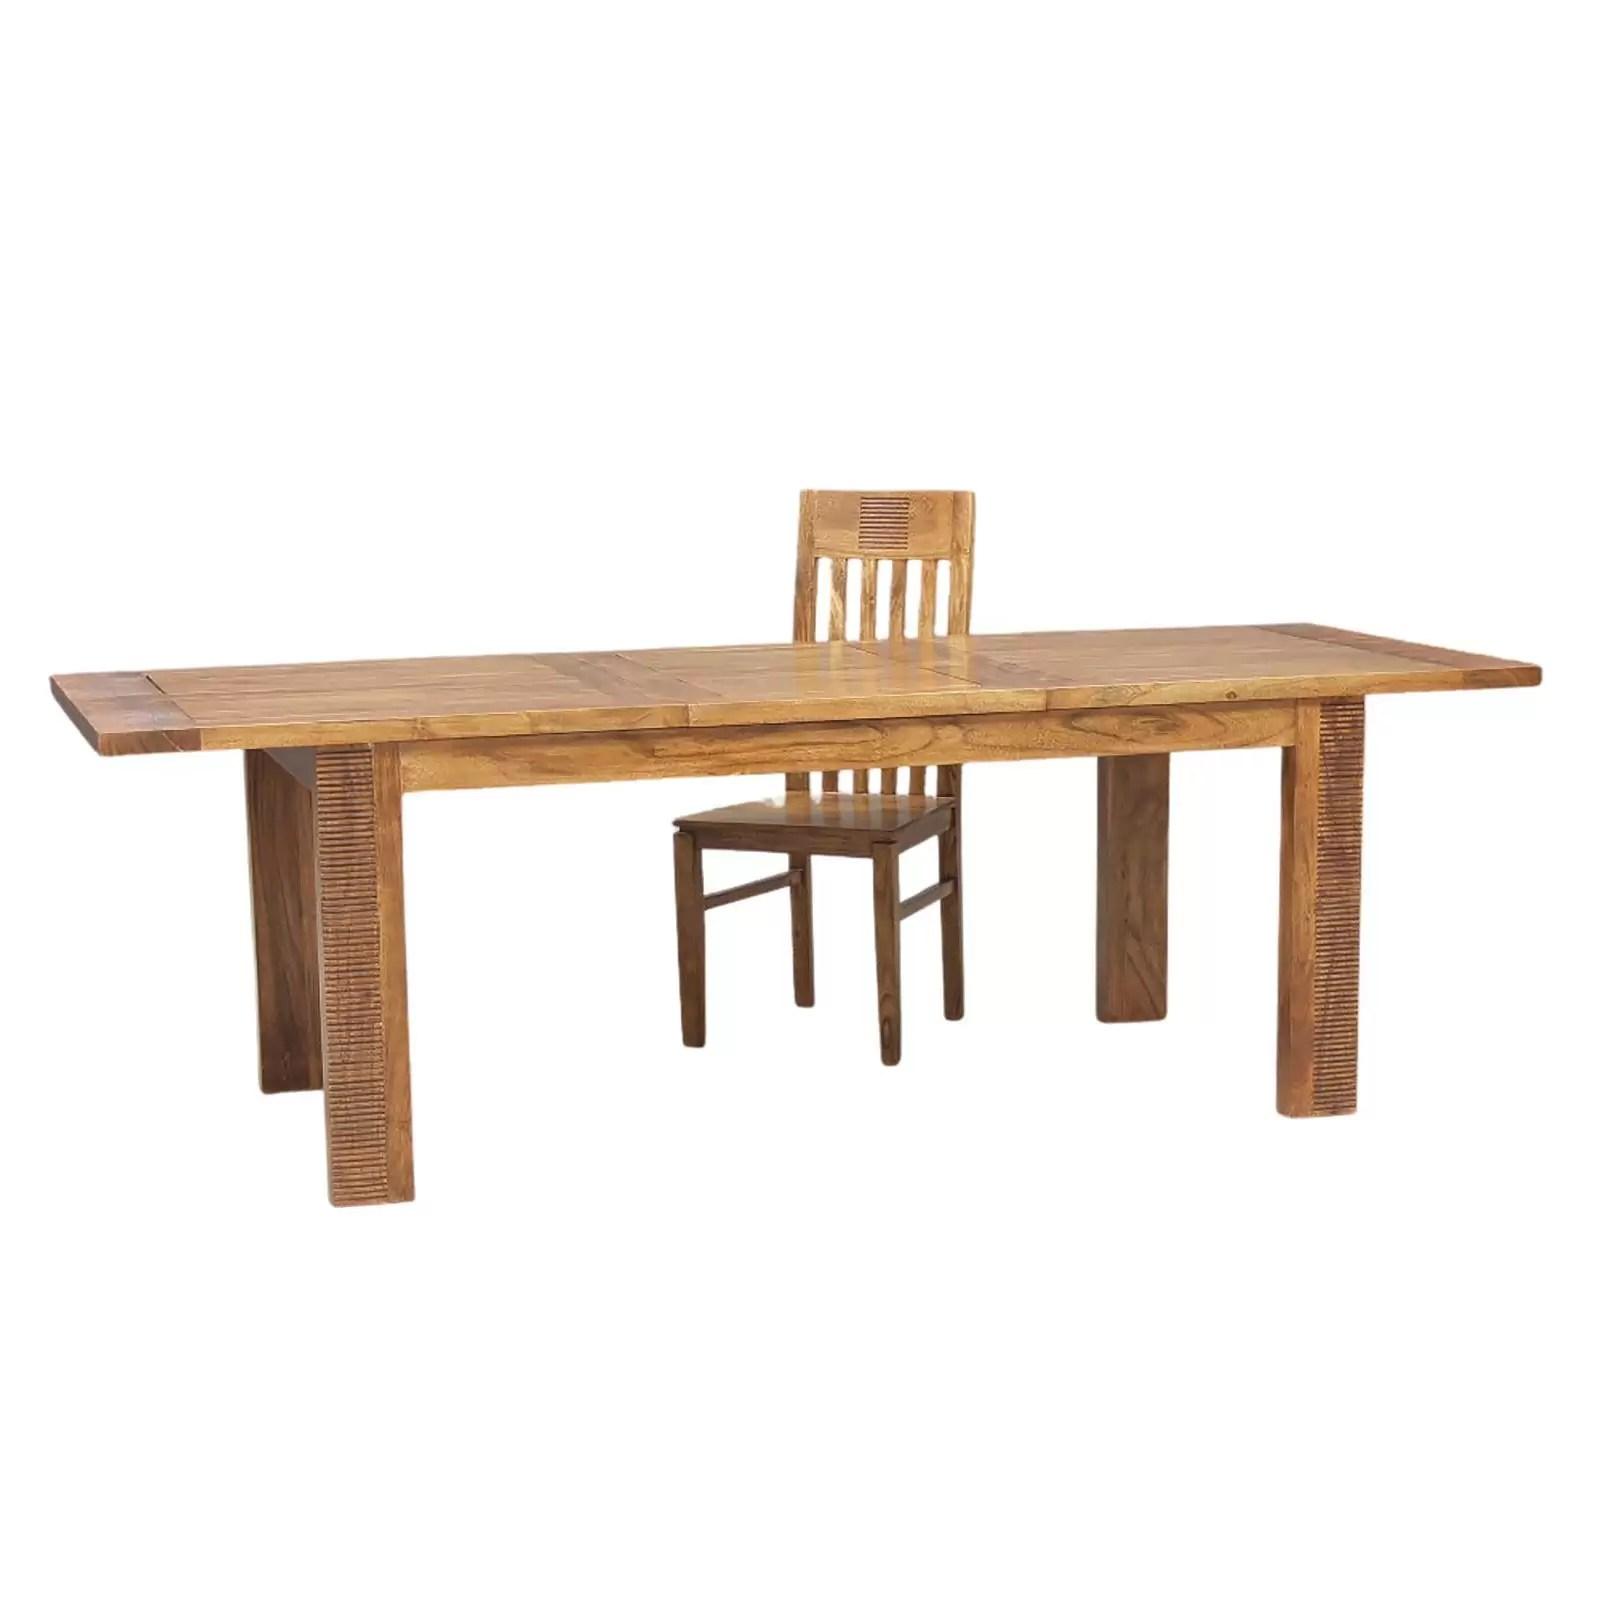 table a manger rectangulaire rallonge bois strie 180 acacia verone